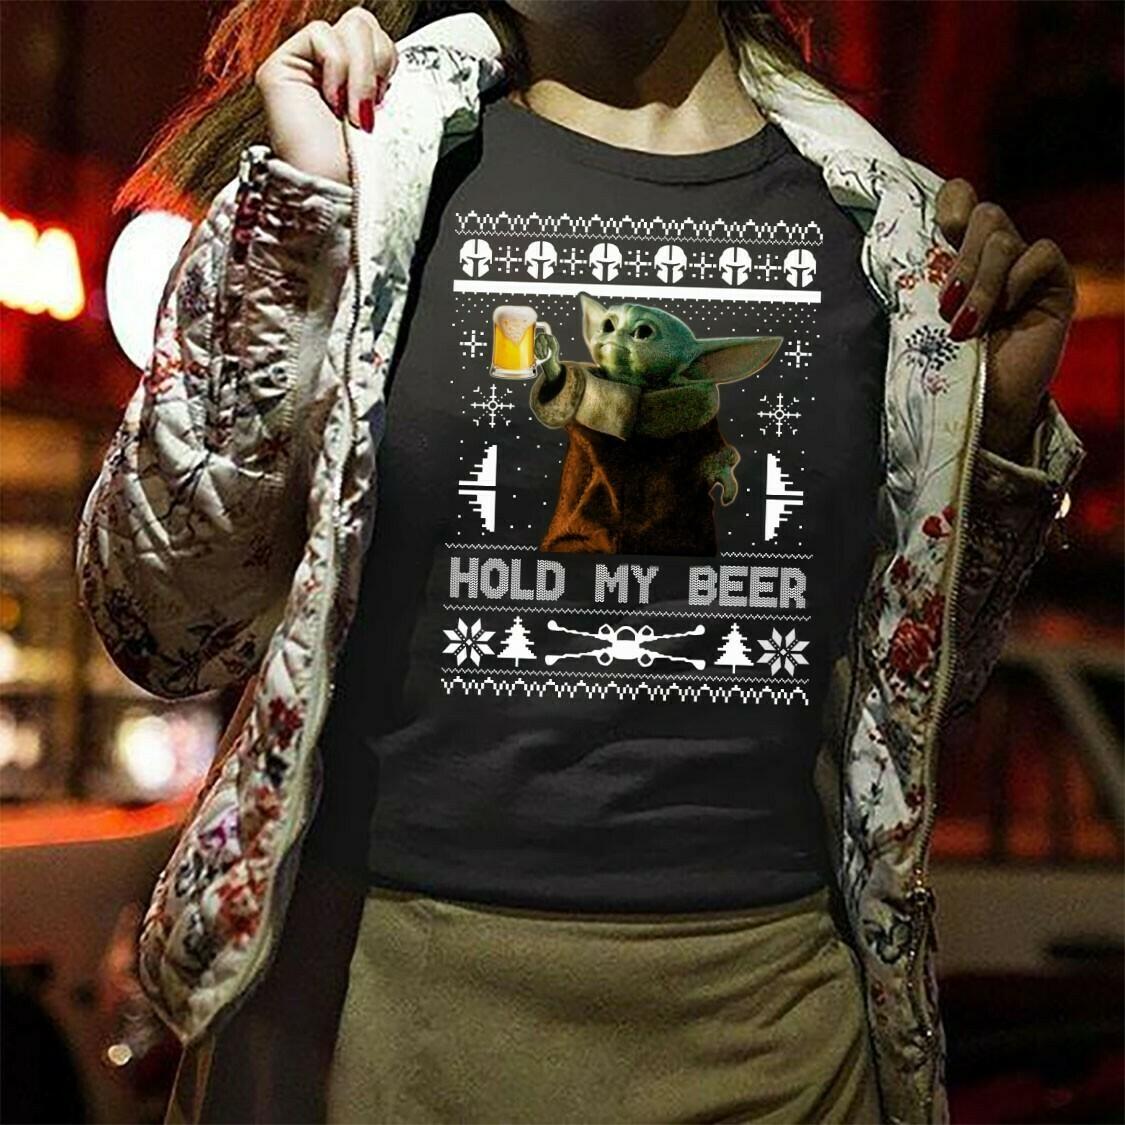 Hold My Beer Baby Yoda,Baby Yoda Spirit Animals,Star Wars Yoda Travel Mug,Yoda hold my beer 3d sweater T-Shirt Long Sleeve Sweatshirt Hoodie Jolly Family Gifts